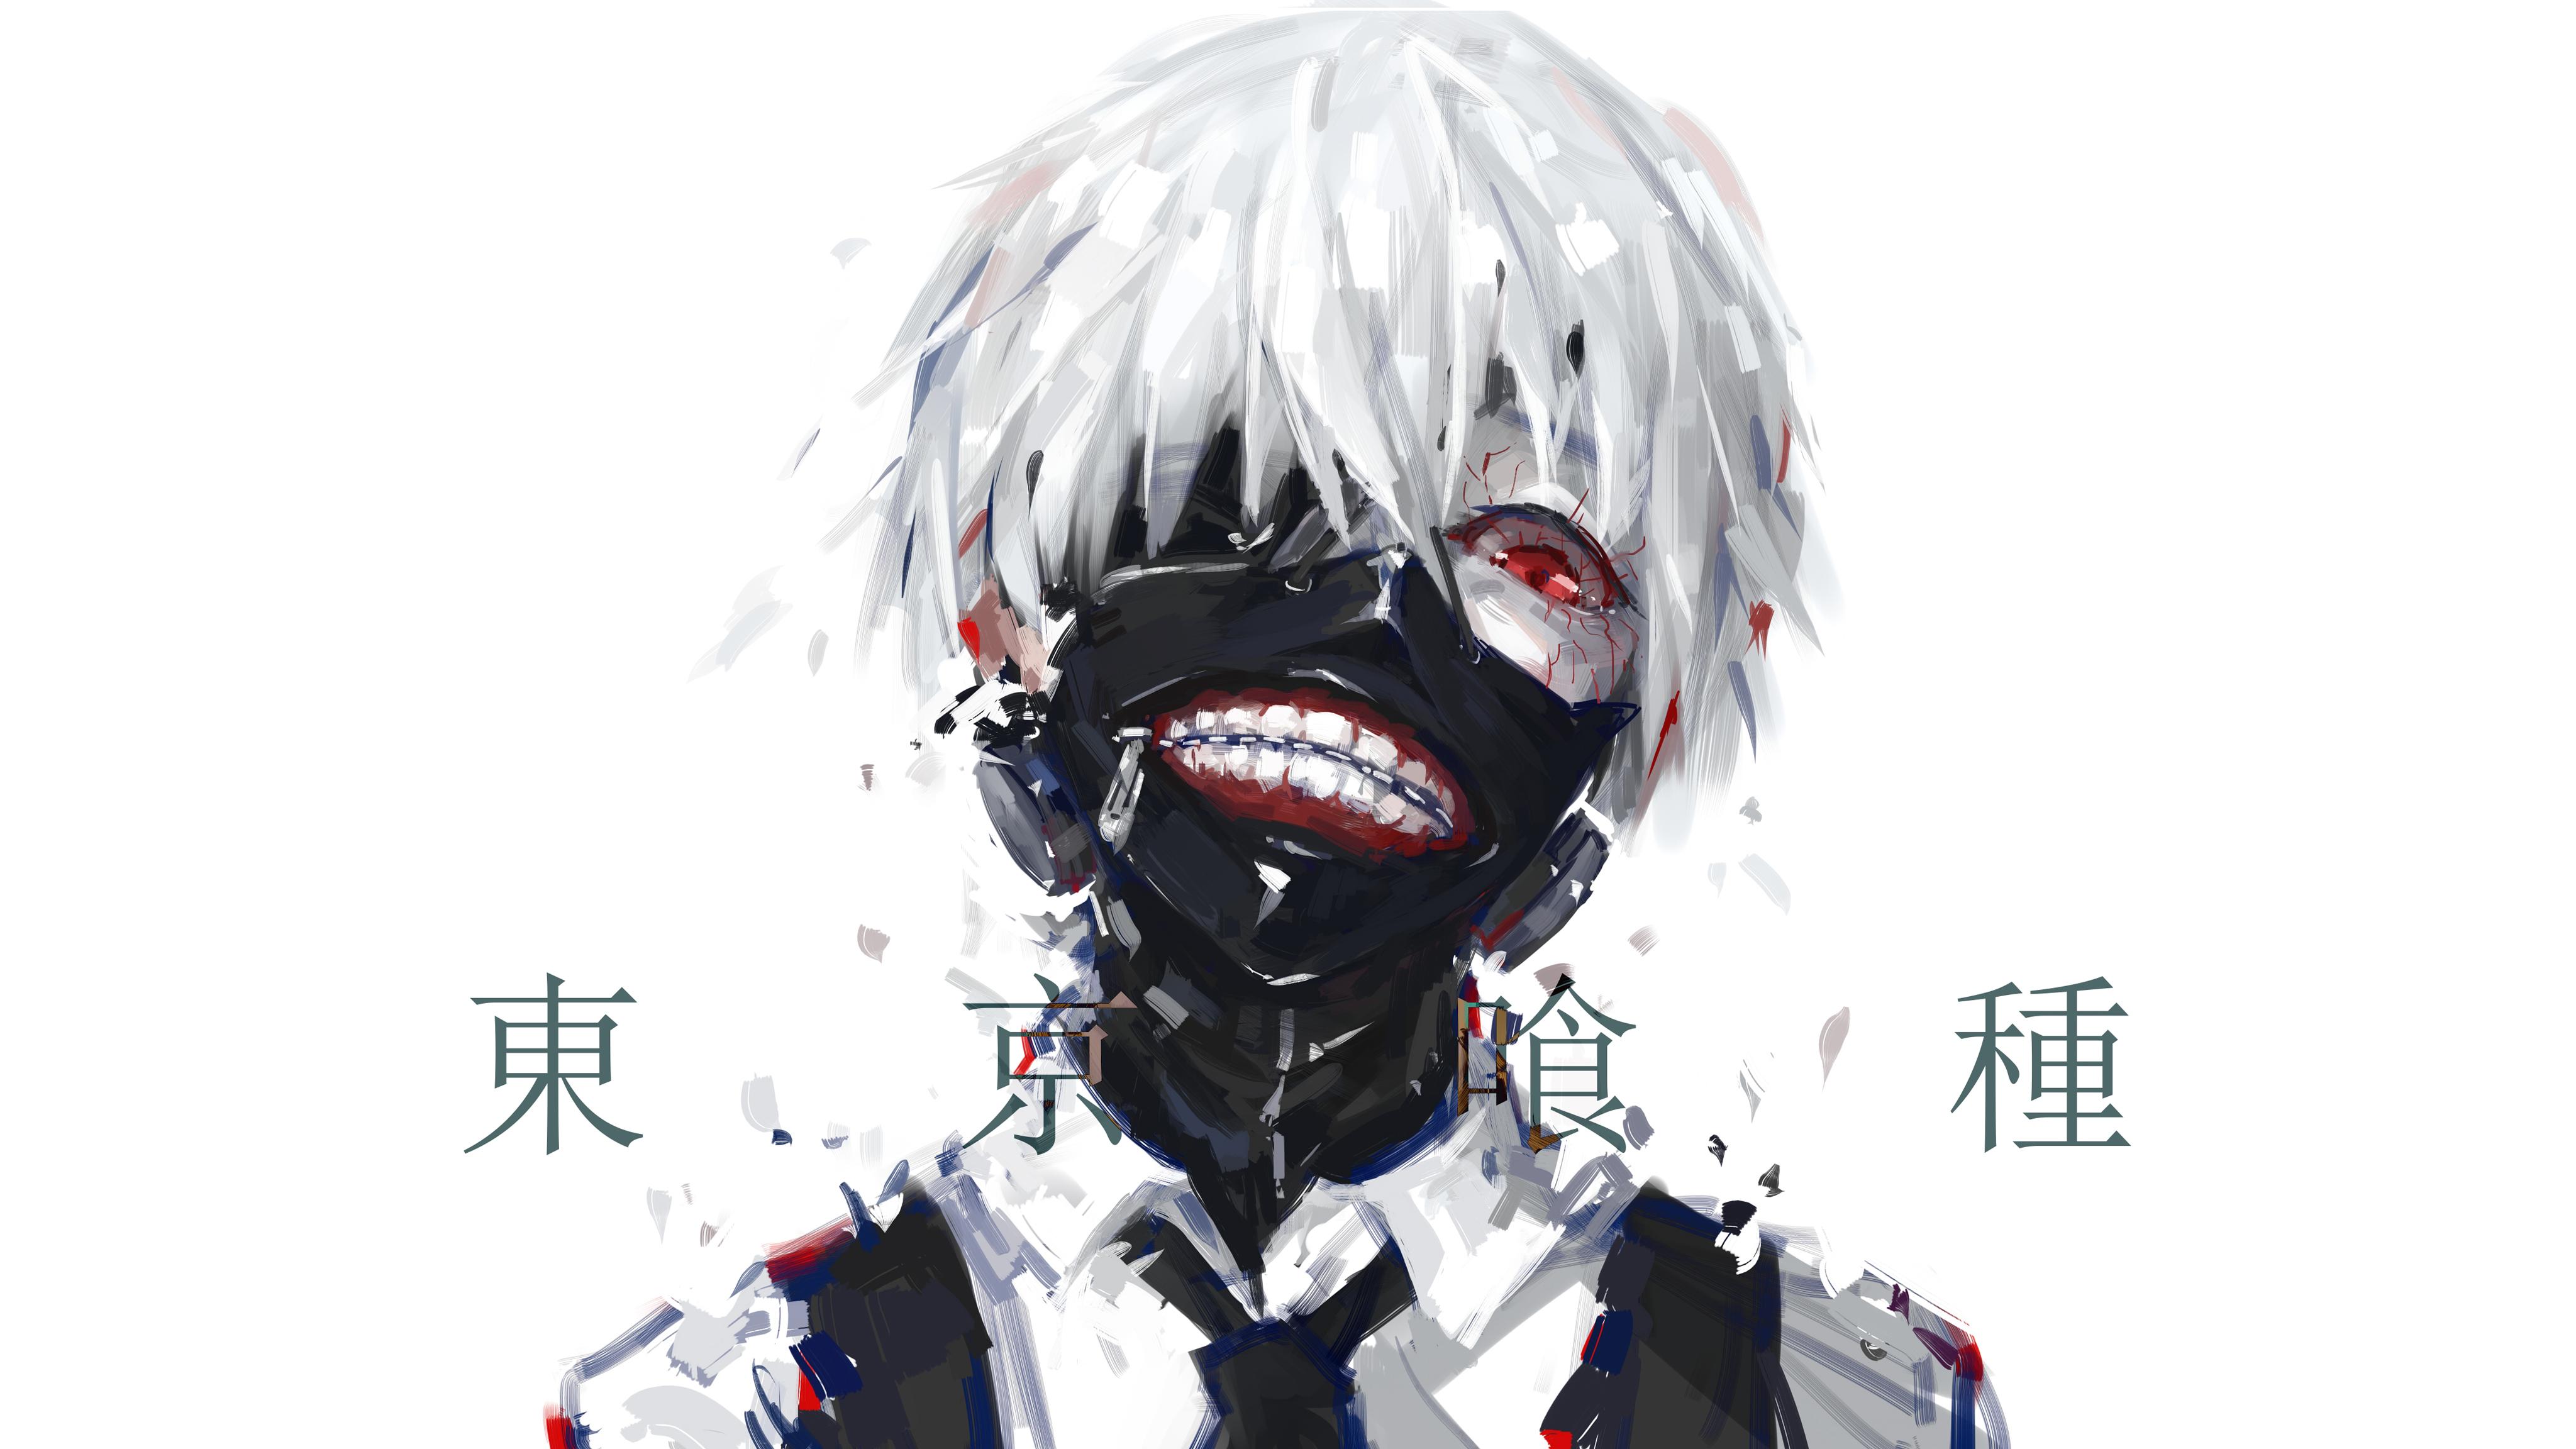 Tokyo Ghoul Episode 12 Season 2 28 Hd Wallpaper Animewp Com